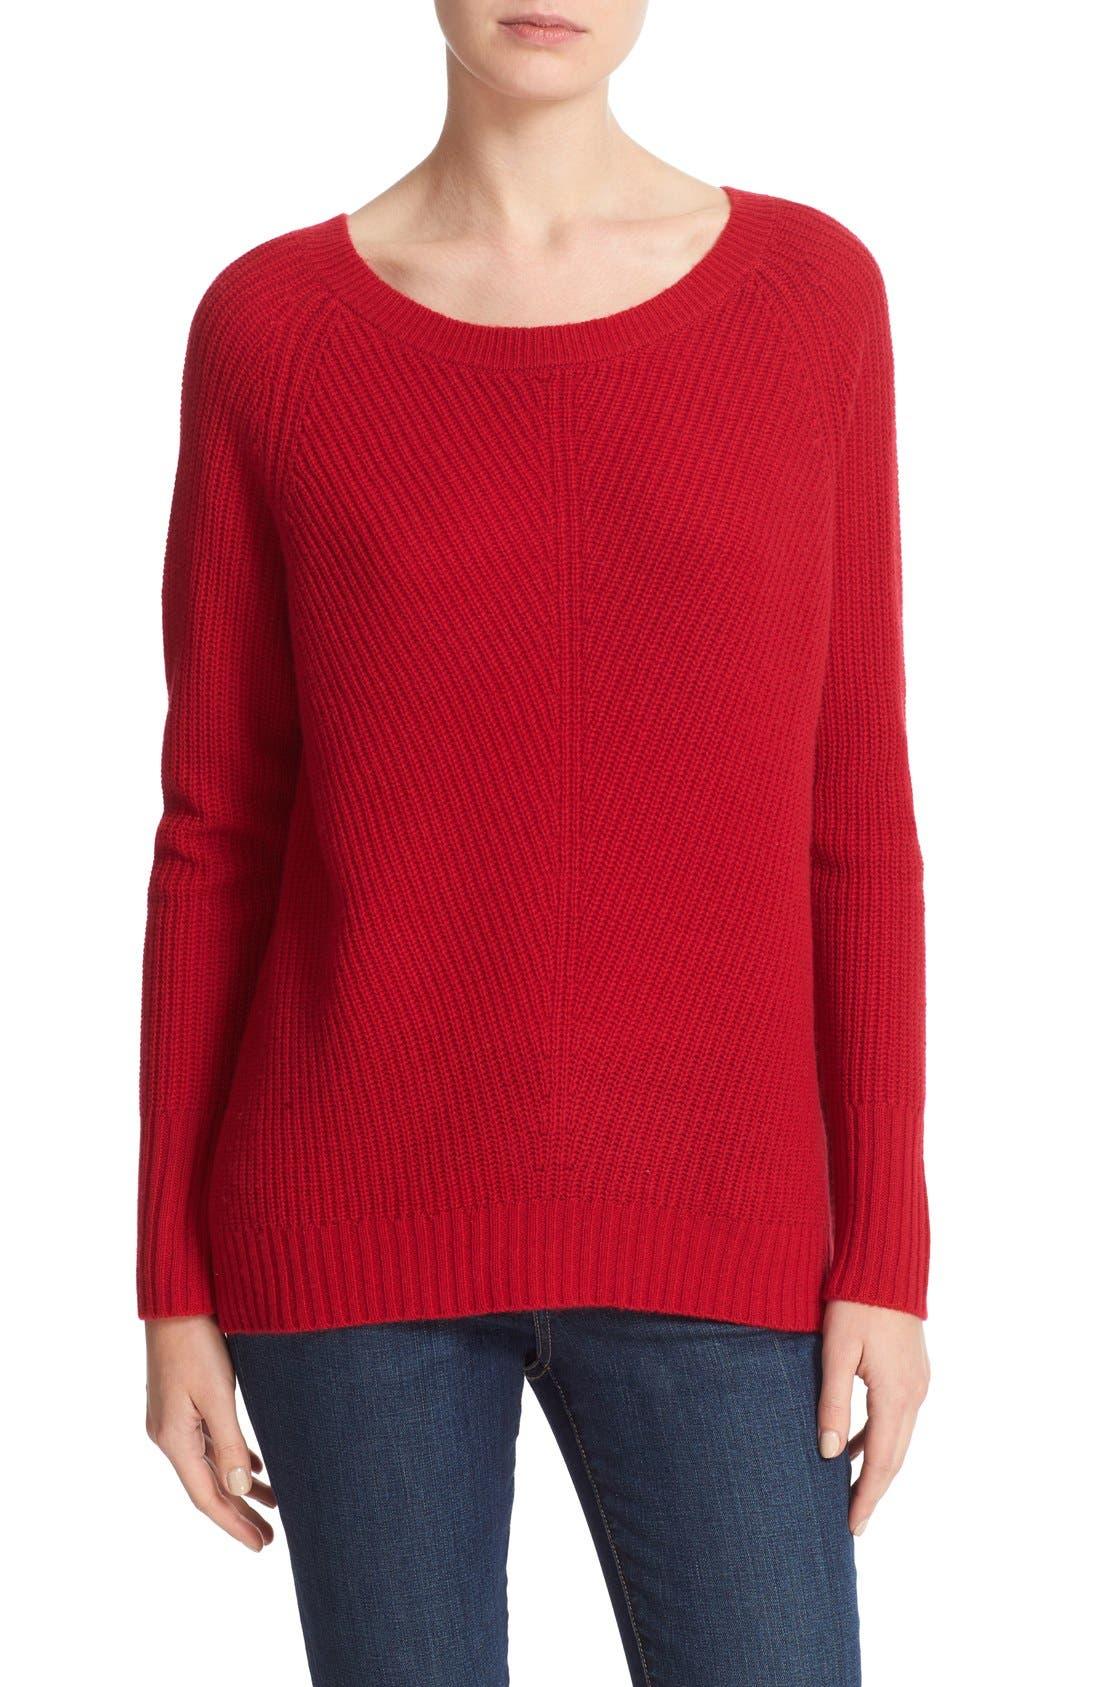 Main Image - Joie Ekin Wool & Cashmere Sweater